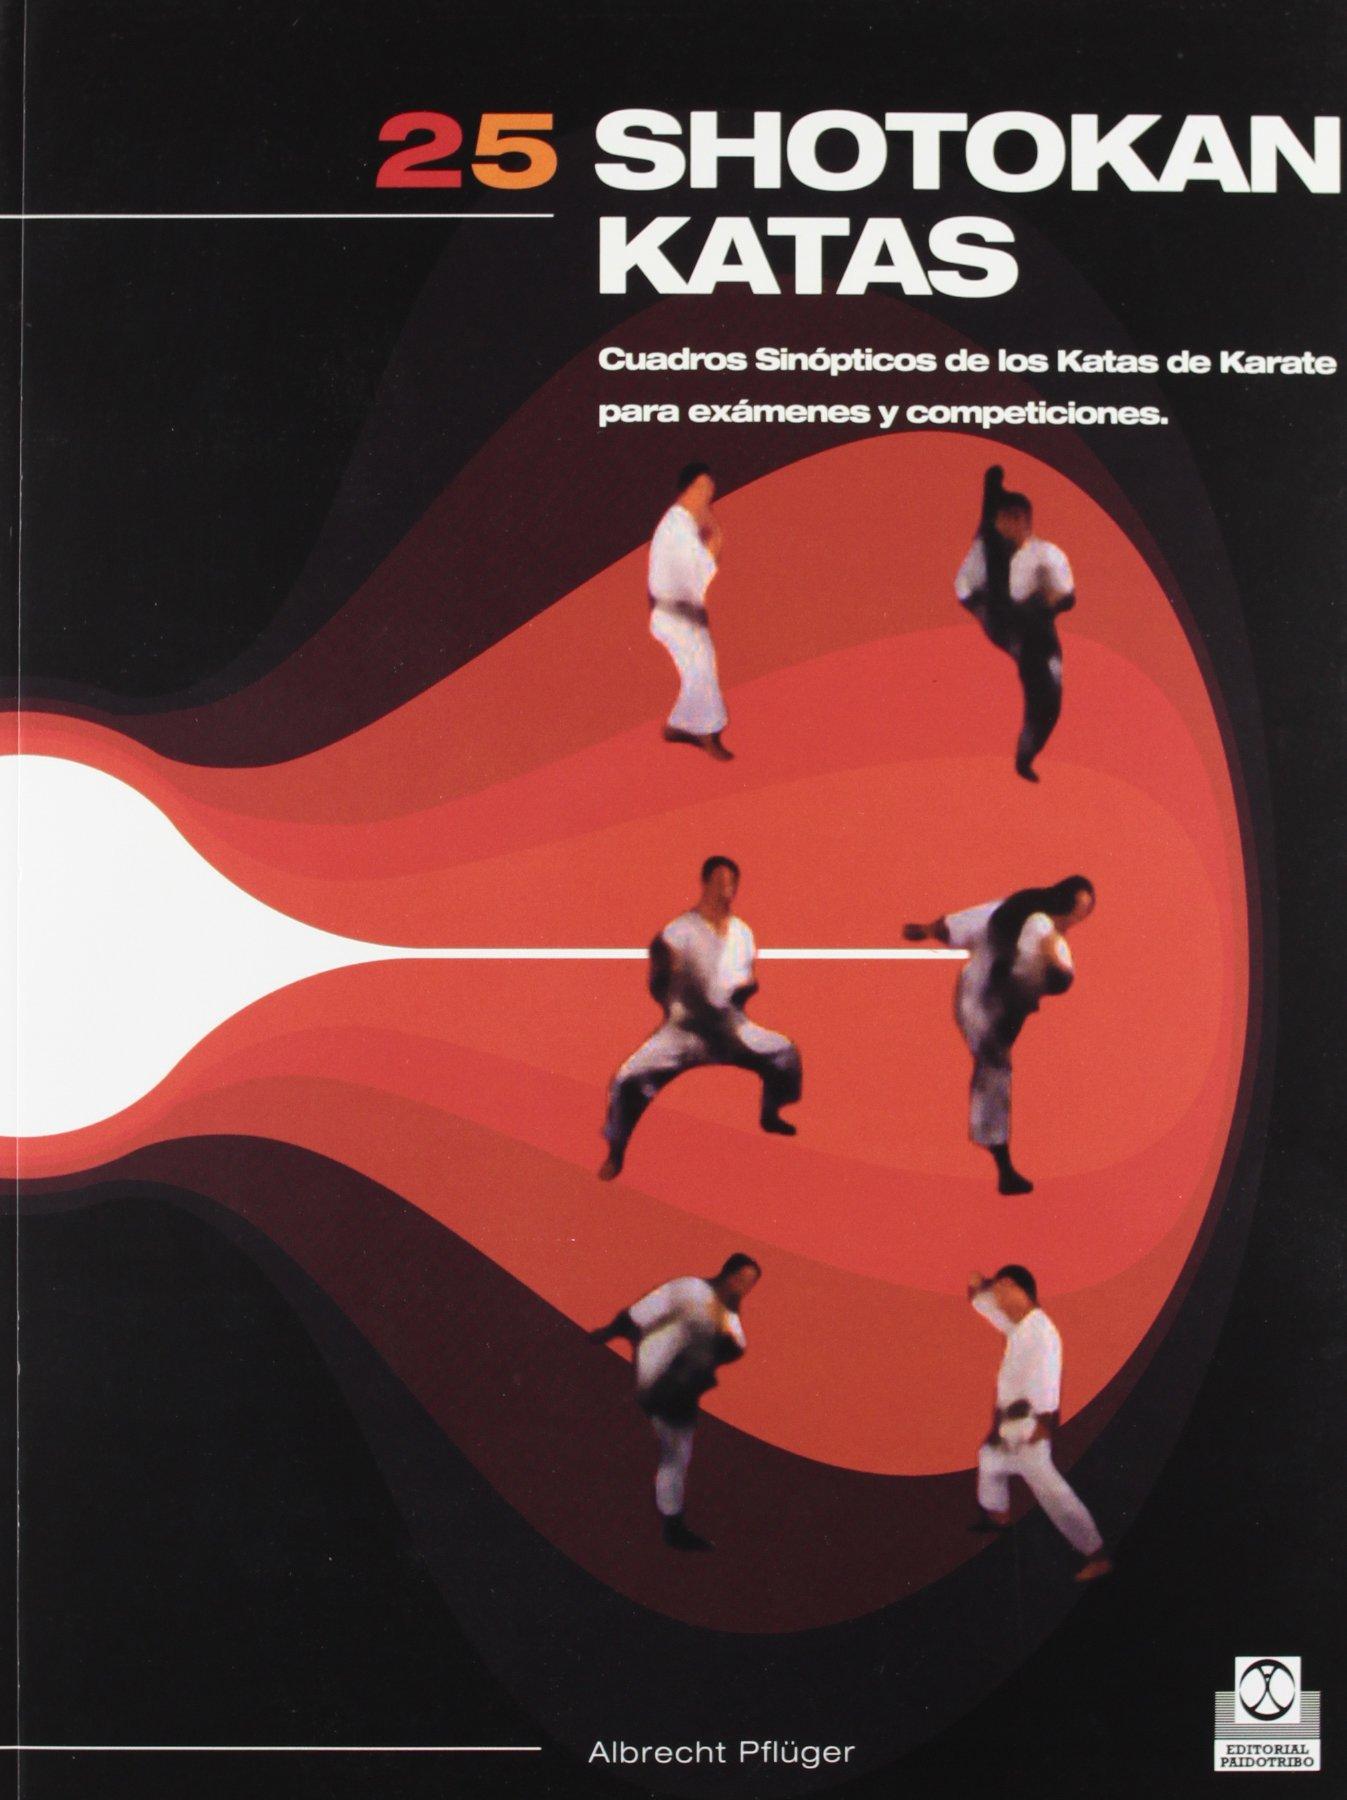 25 Shotokan Kats (Artes Marciales) (Spanish Edition) by Paidotribo Editorial